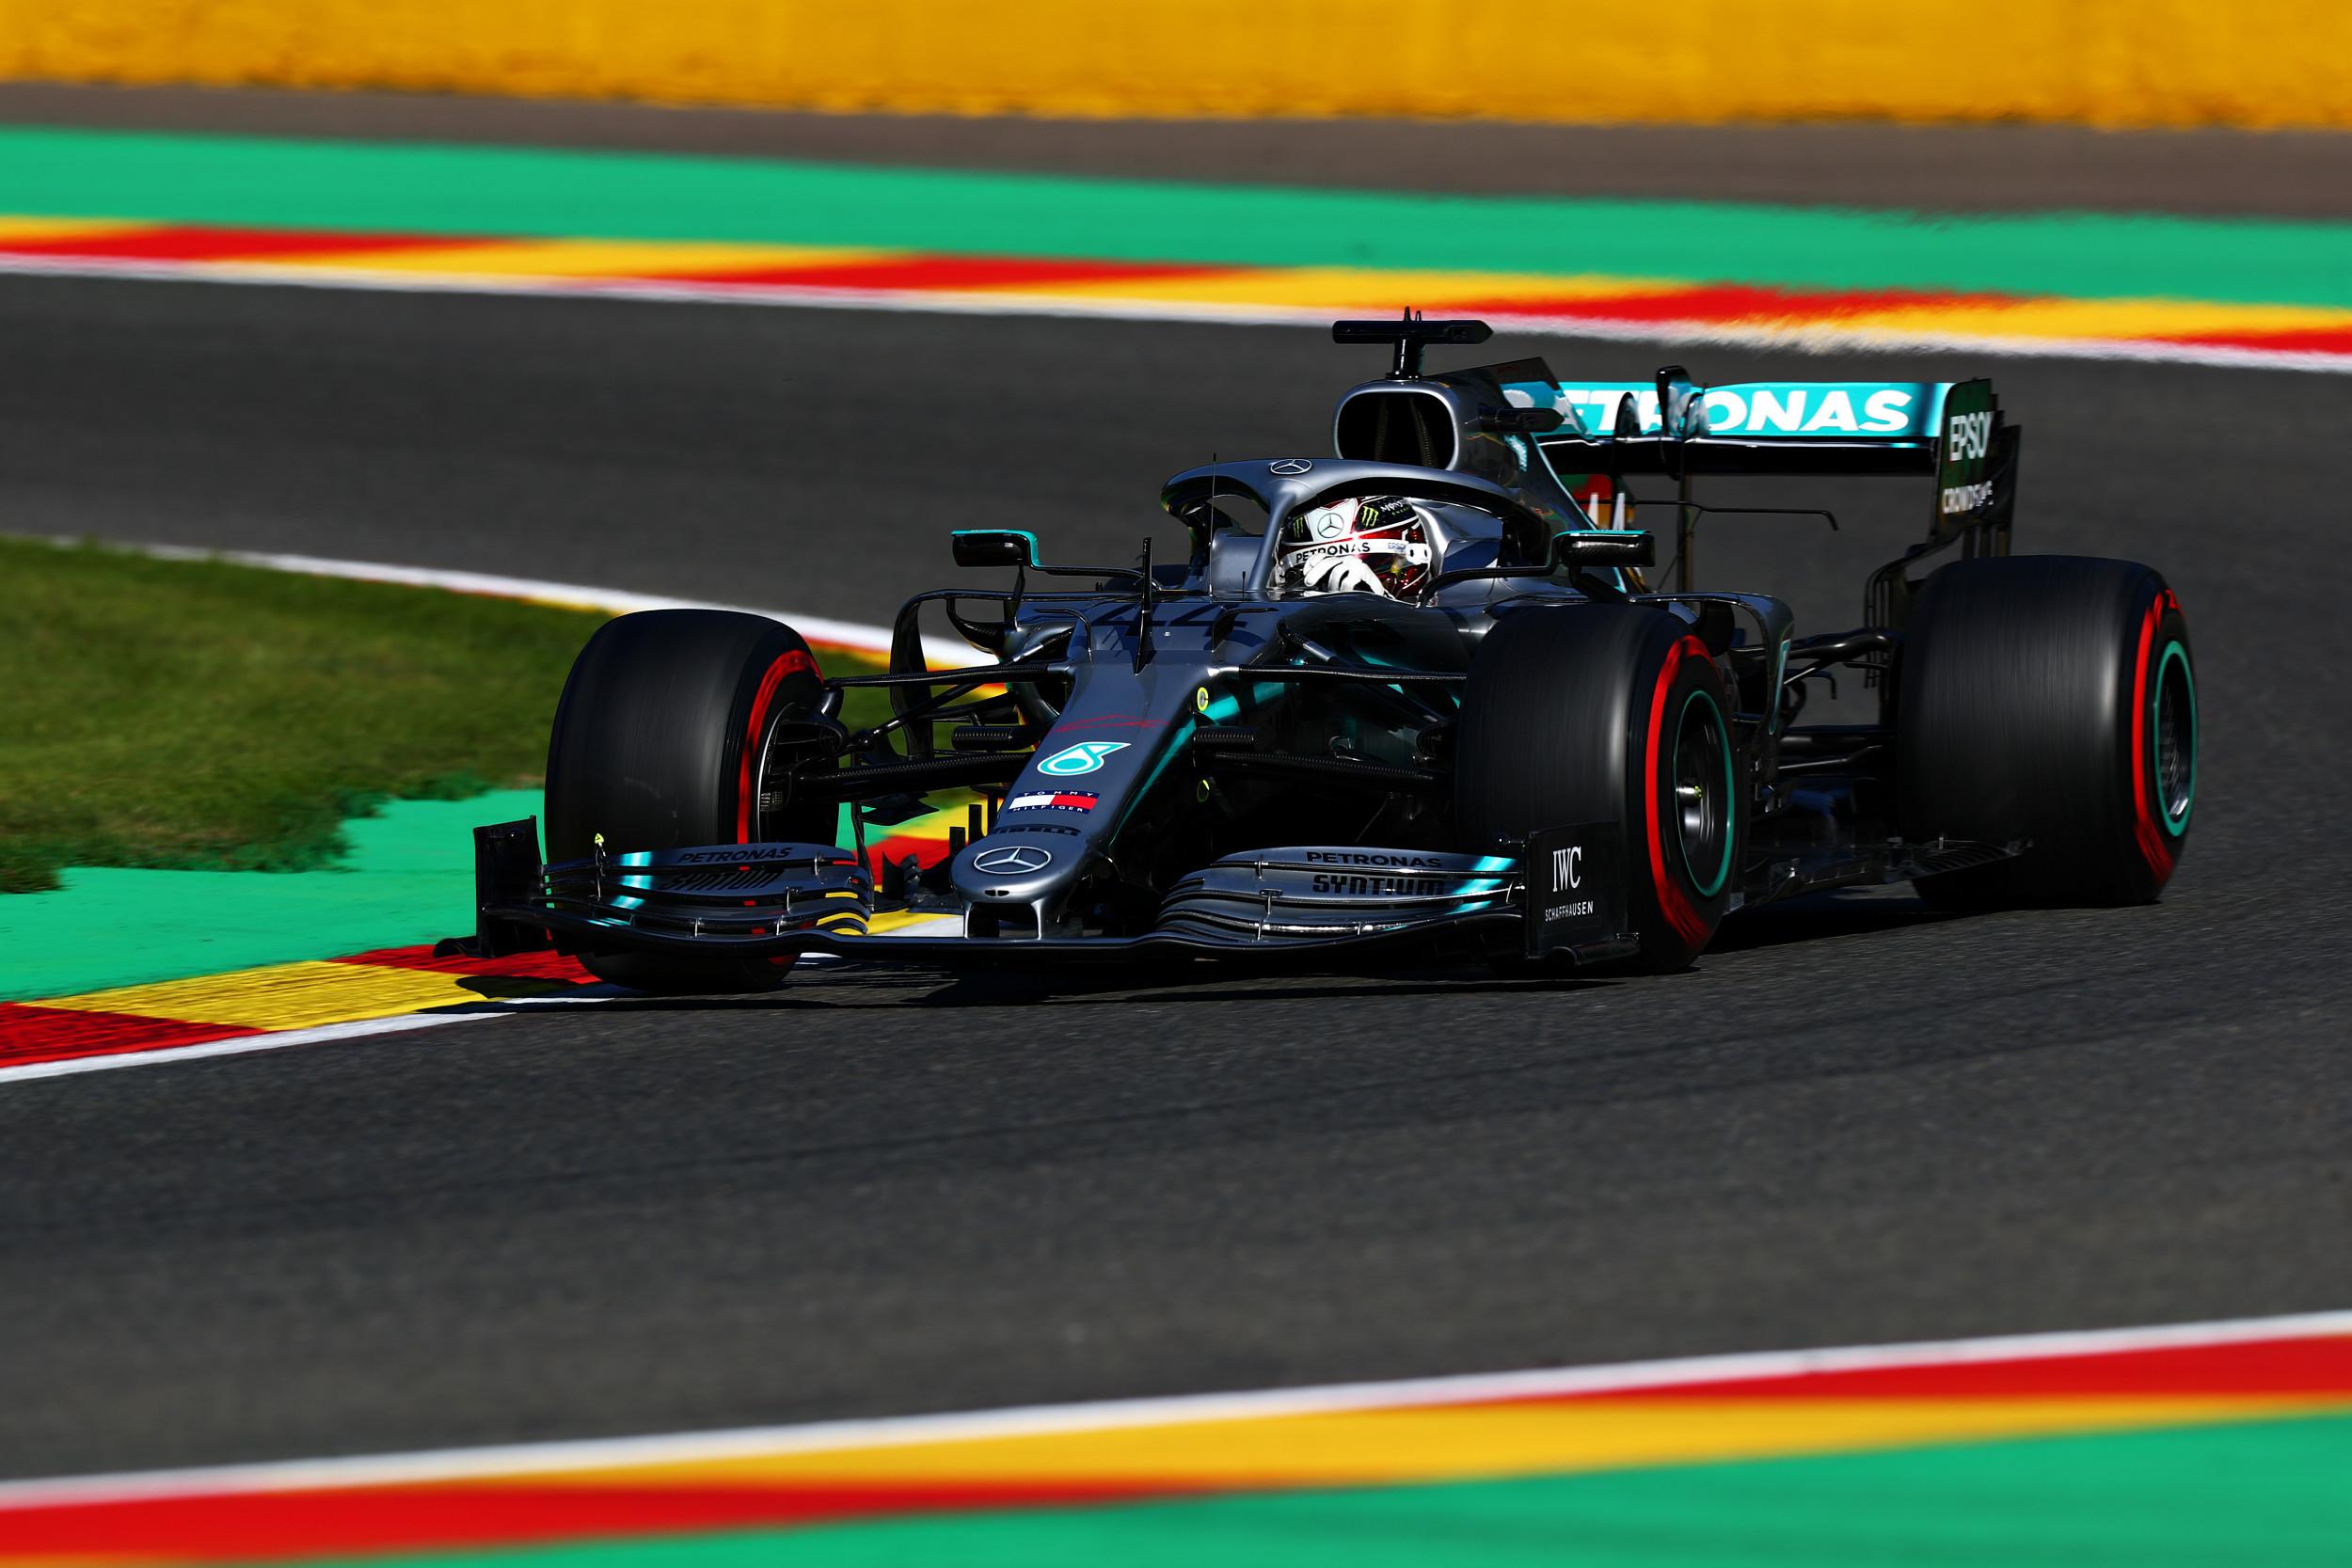 F1 Race Schedule 2019: Belgian Grand Prix Start Time, TV